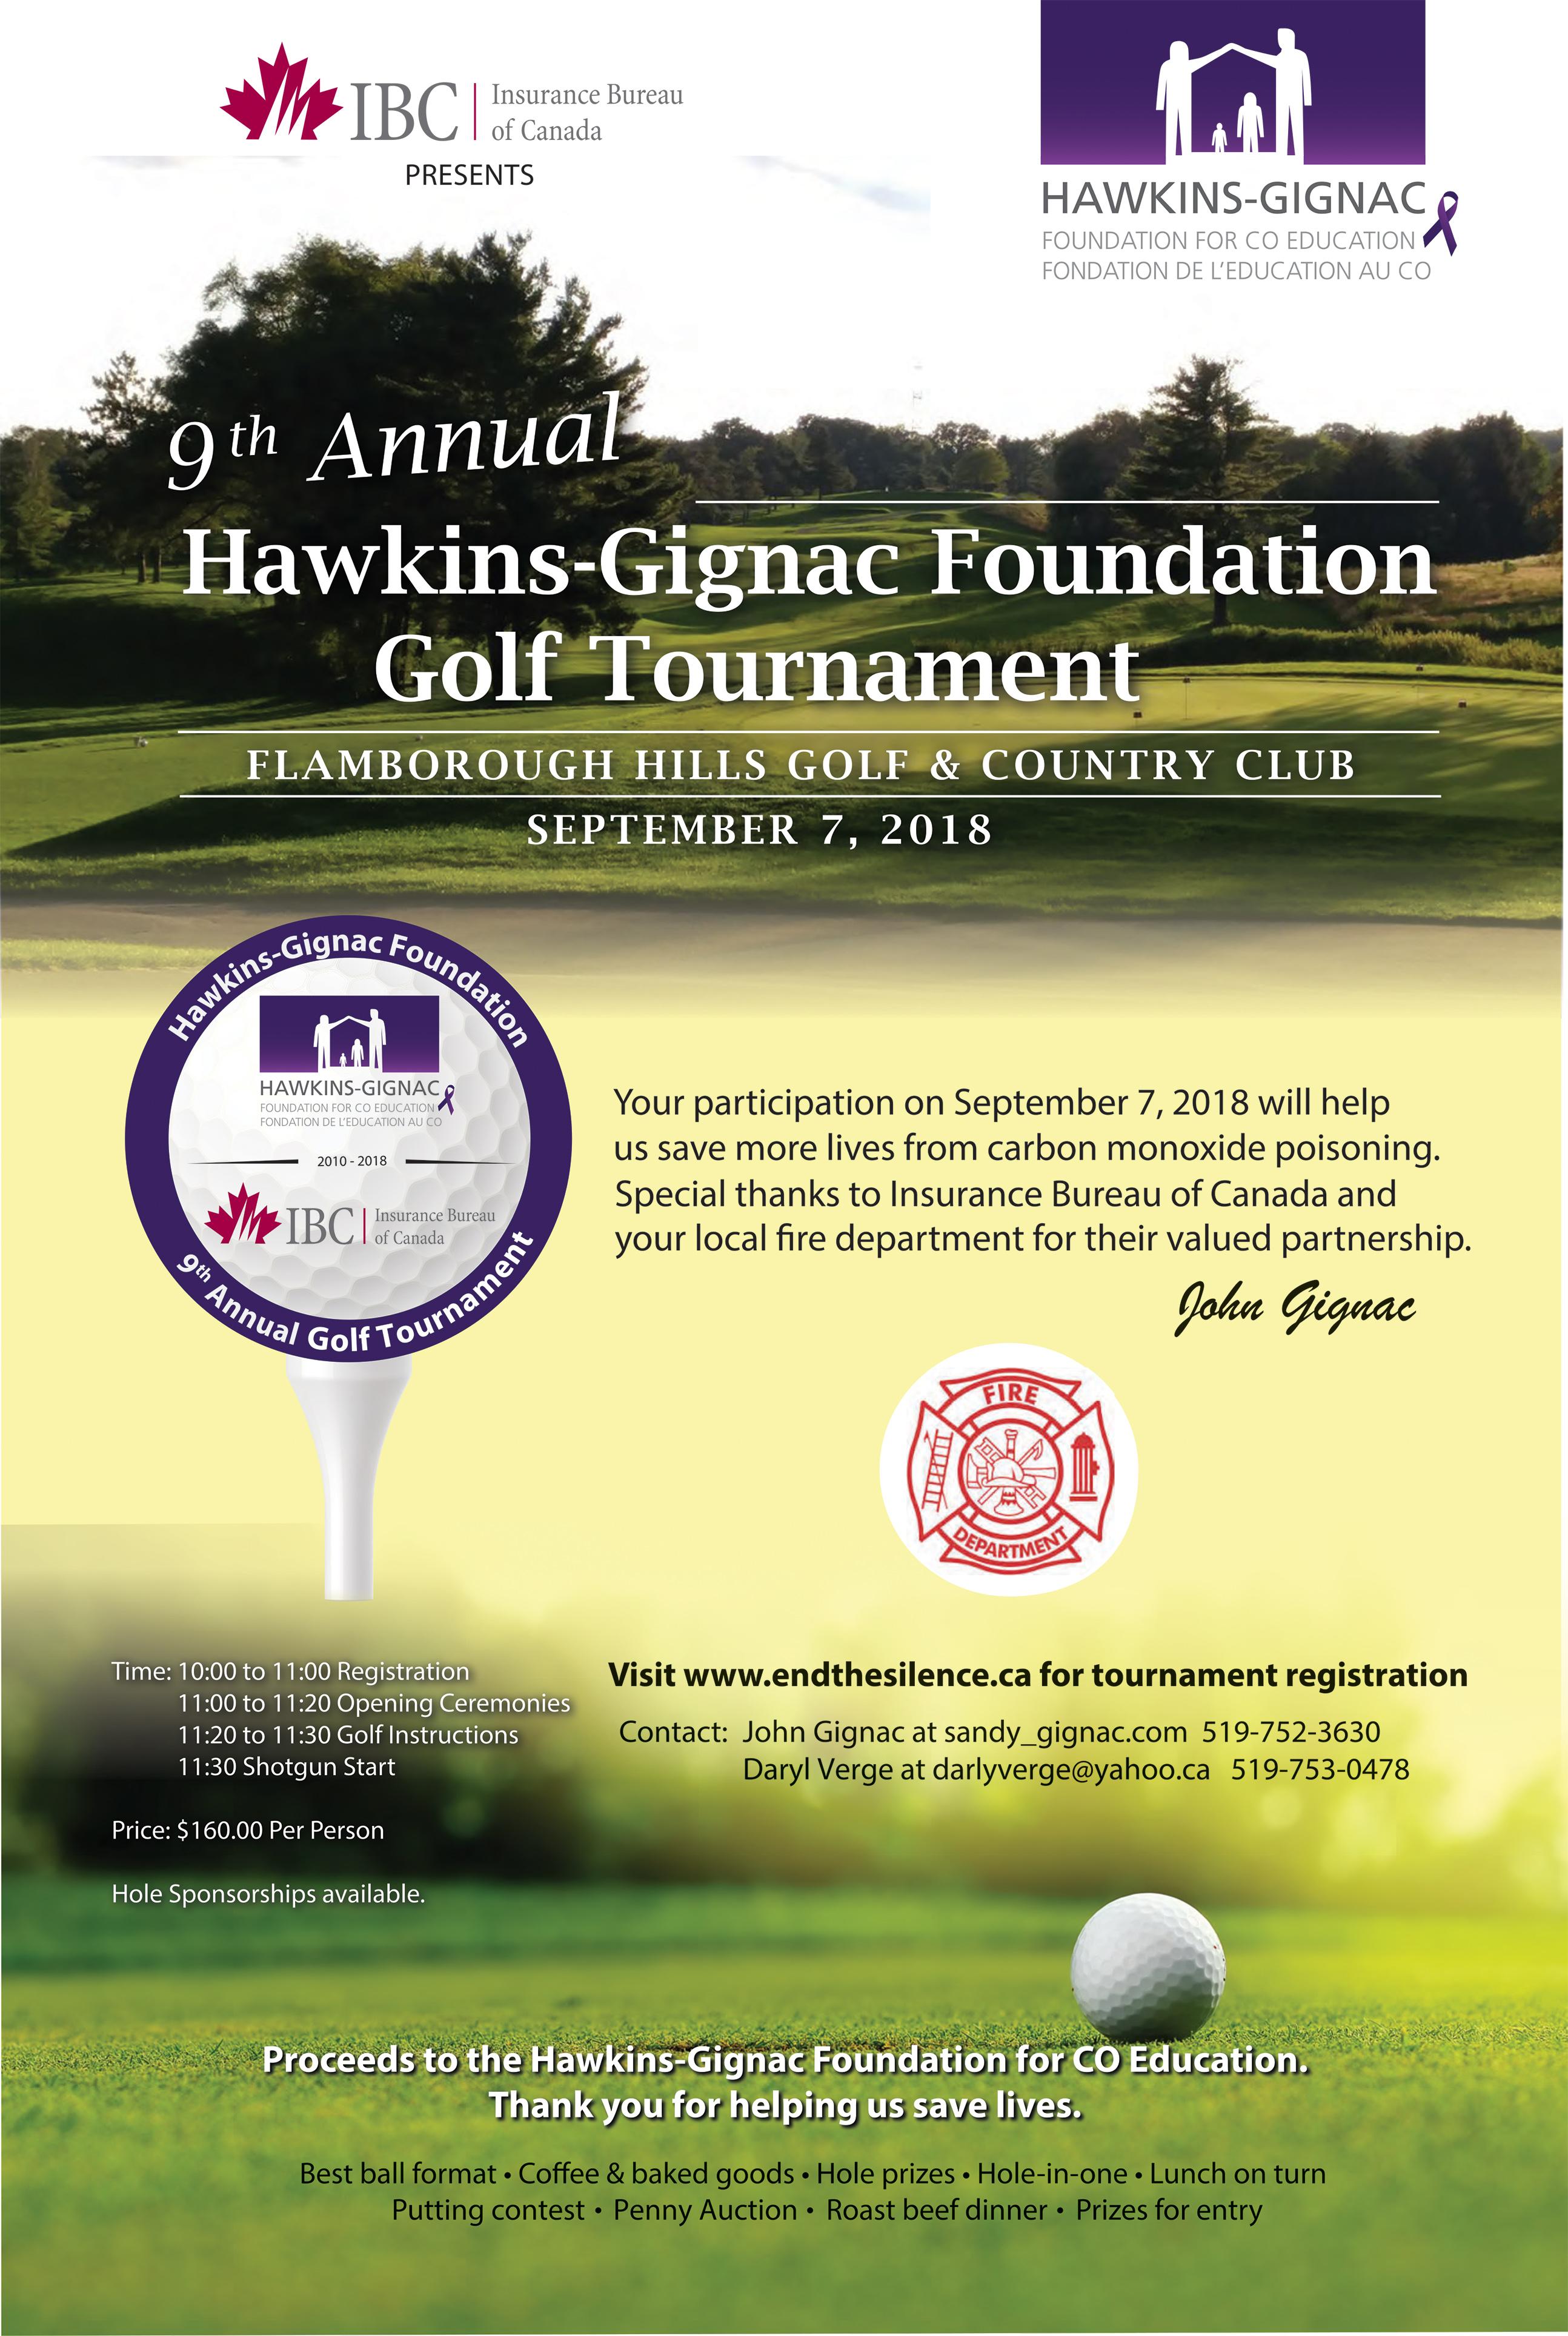 Hawkins-Gignac Golf Tournament 2018